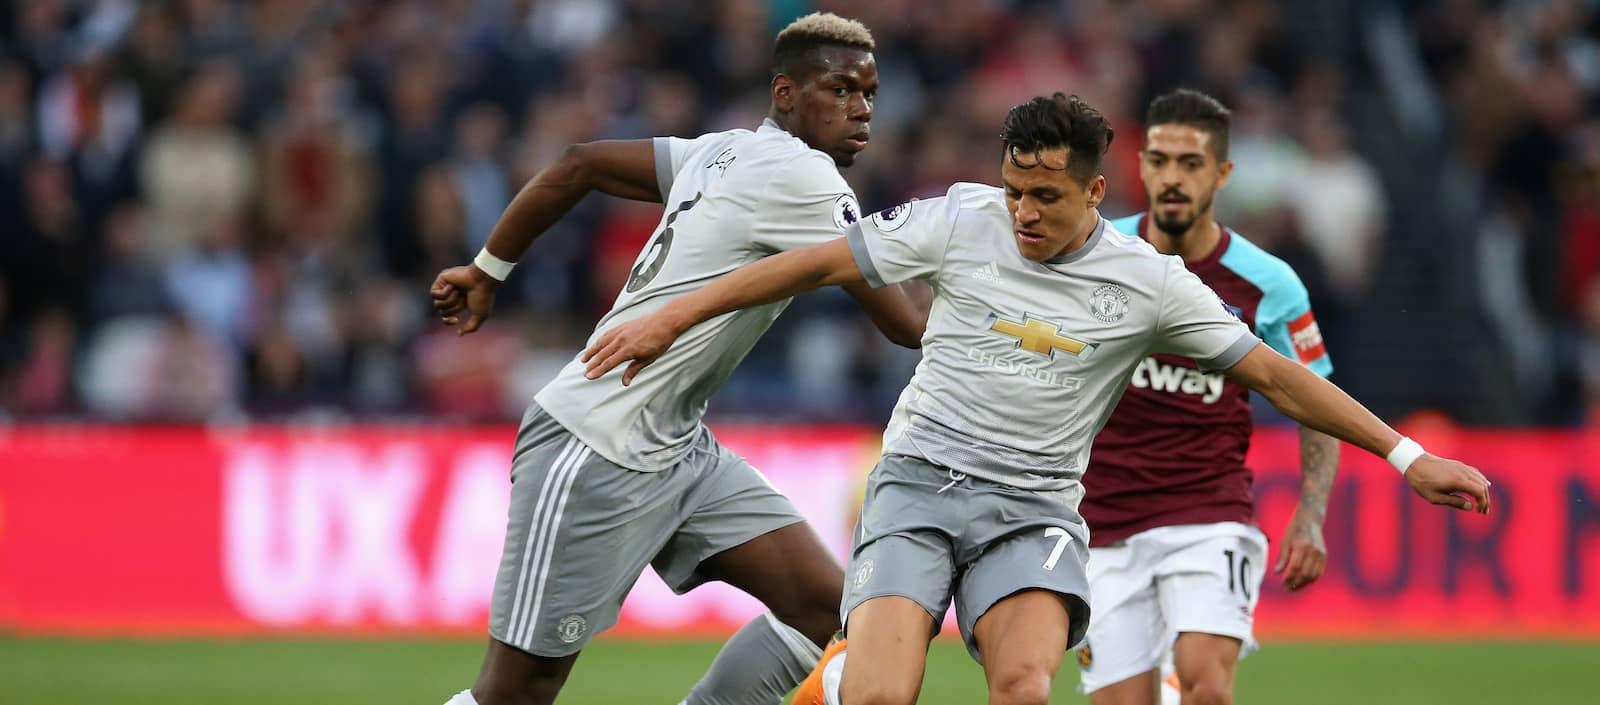 9f8250310e0 Photos: Manchester United reveal third kit for 2018/19 season